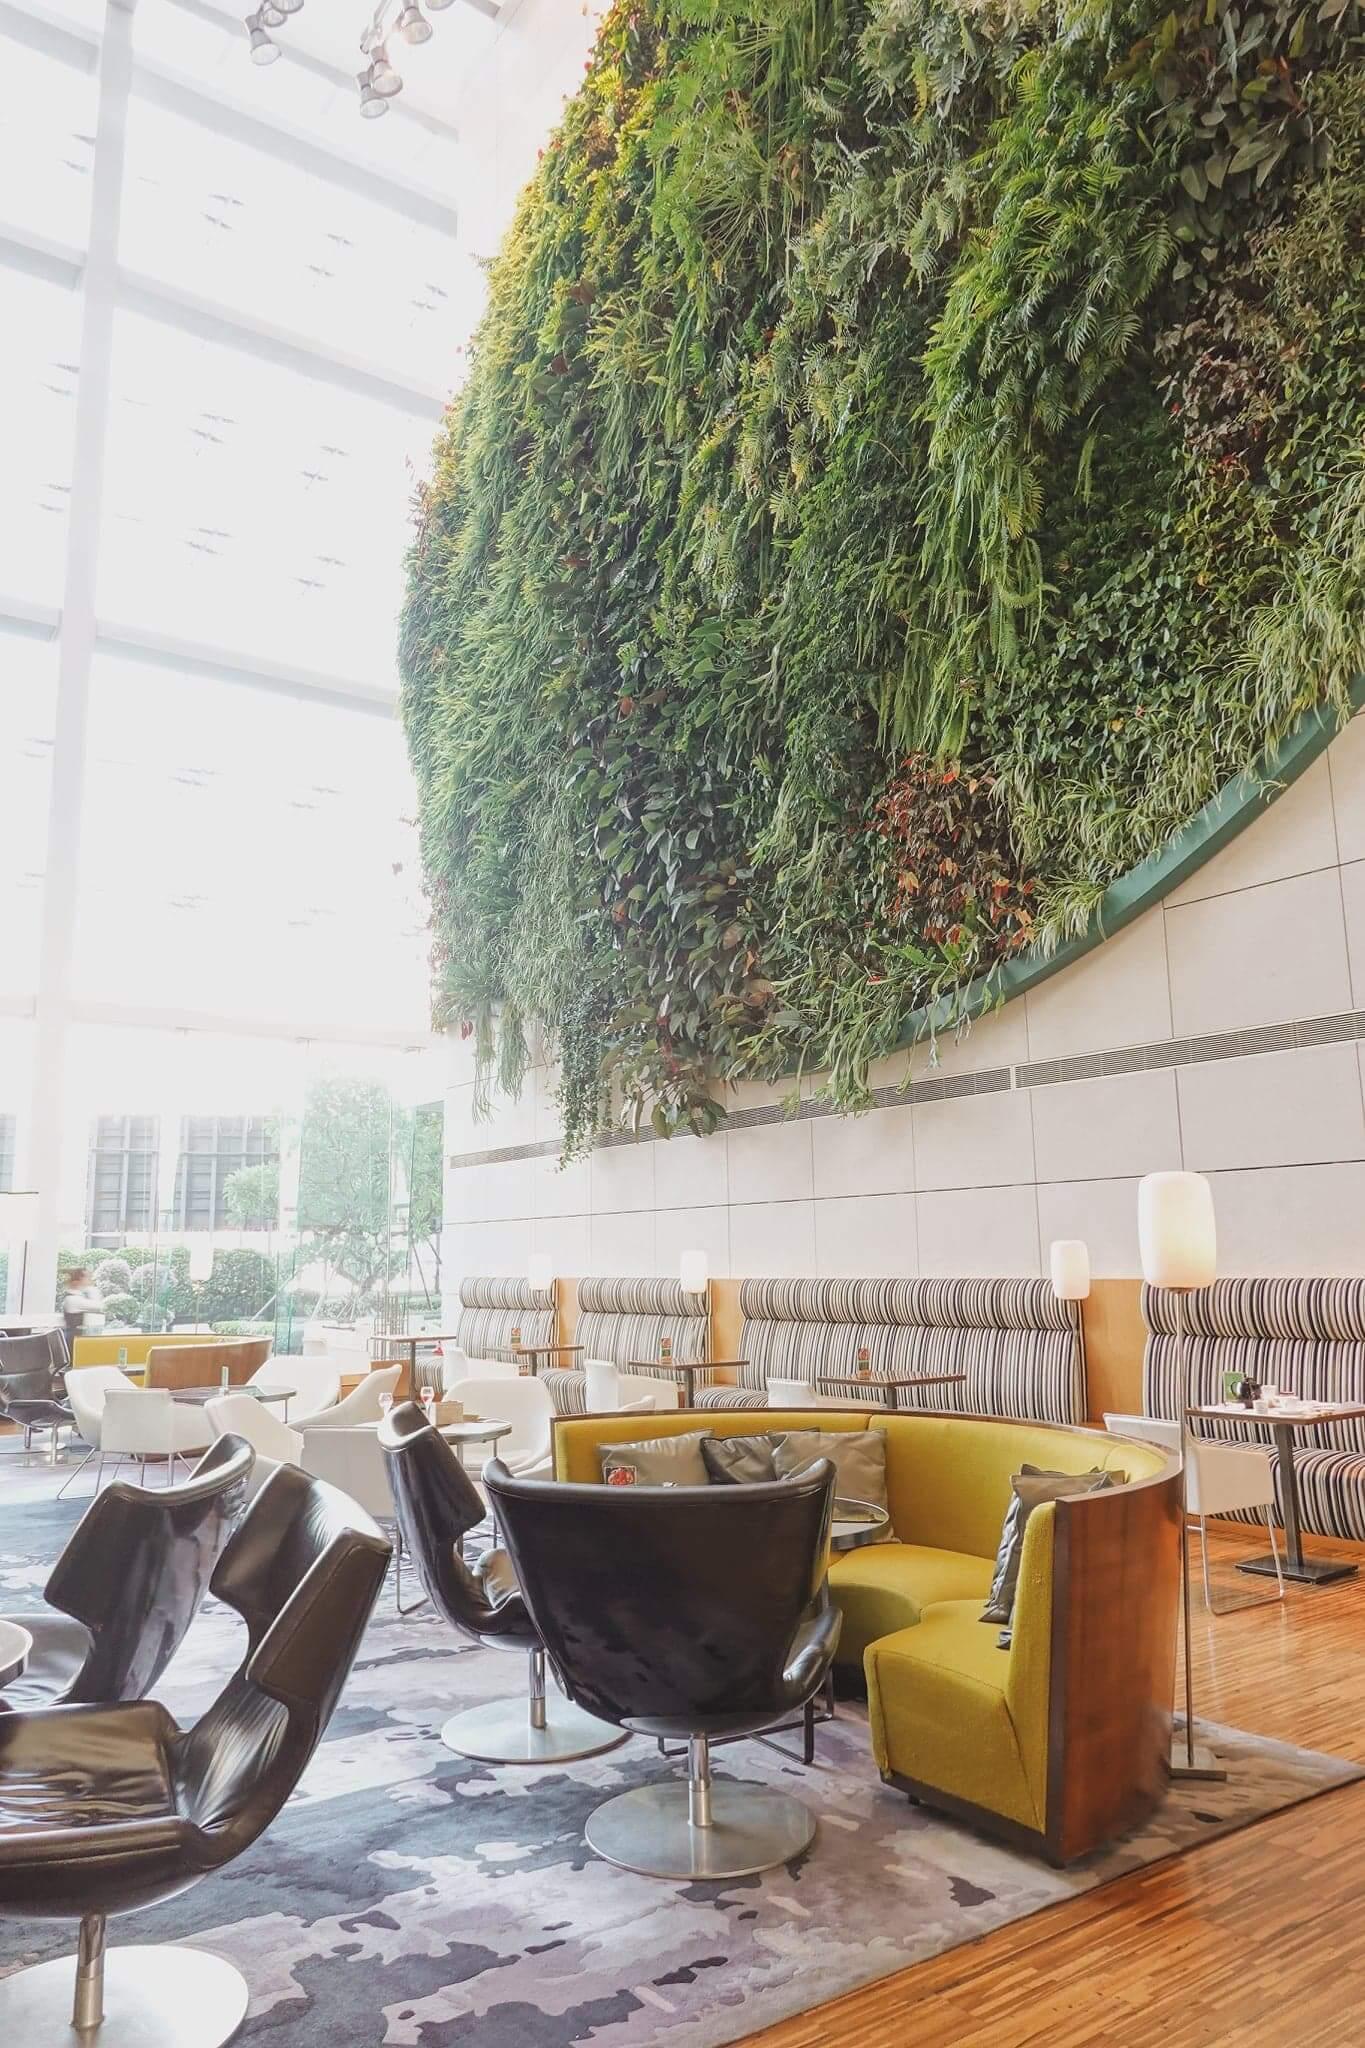 GREEN擁有亞洲最大室內垂直花園,環境充滿綠意。